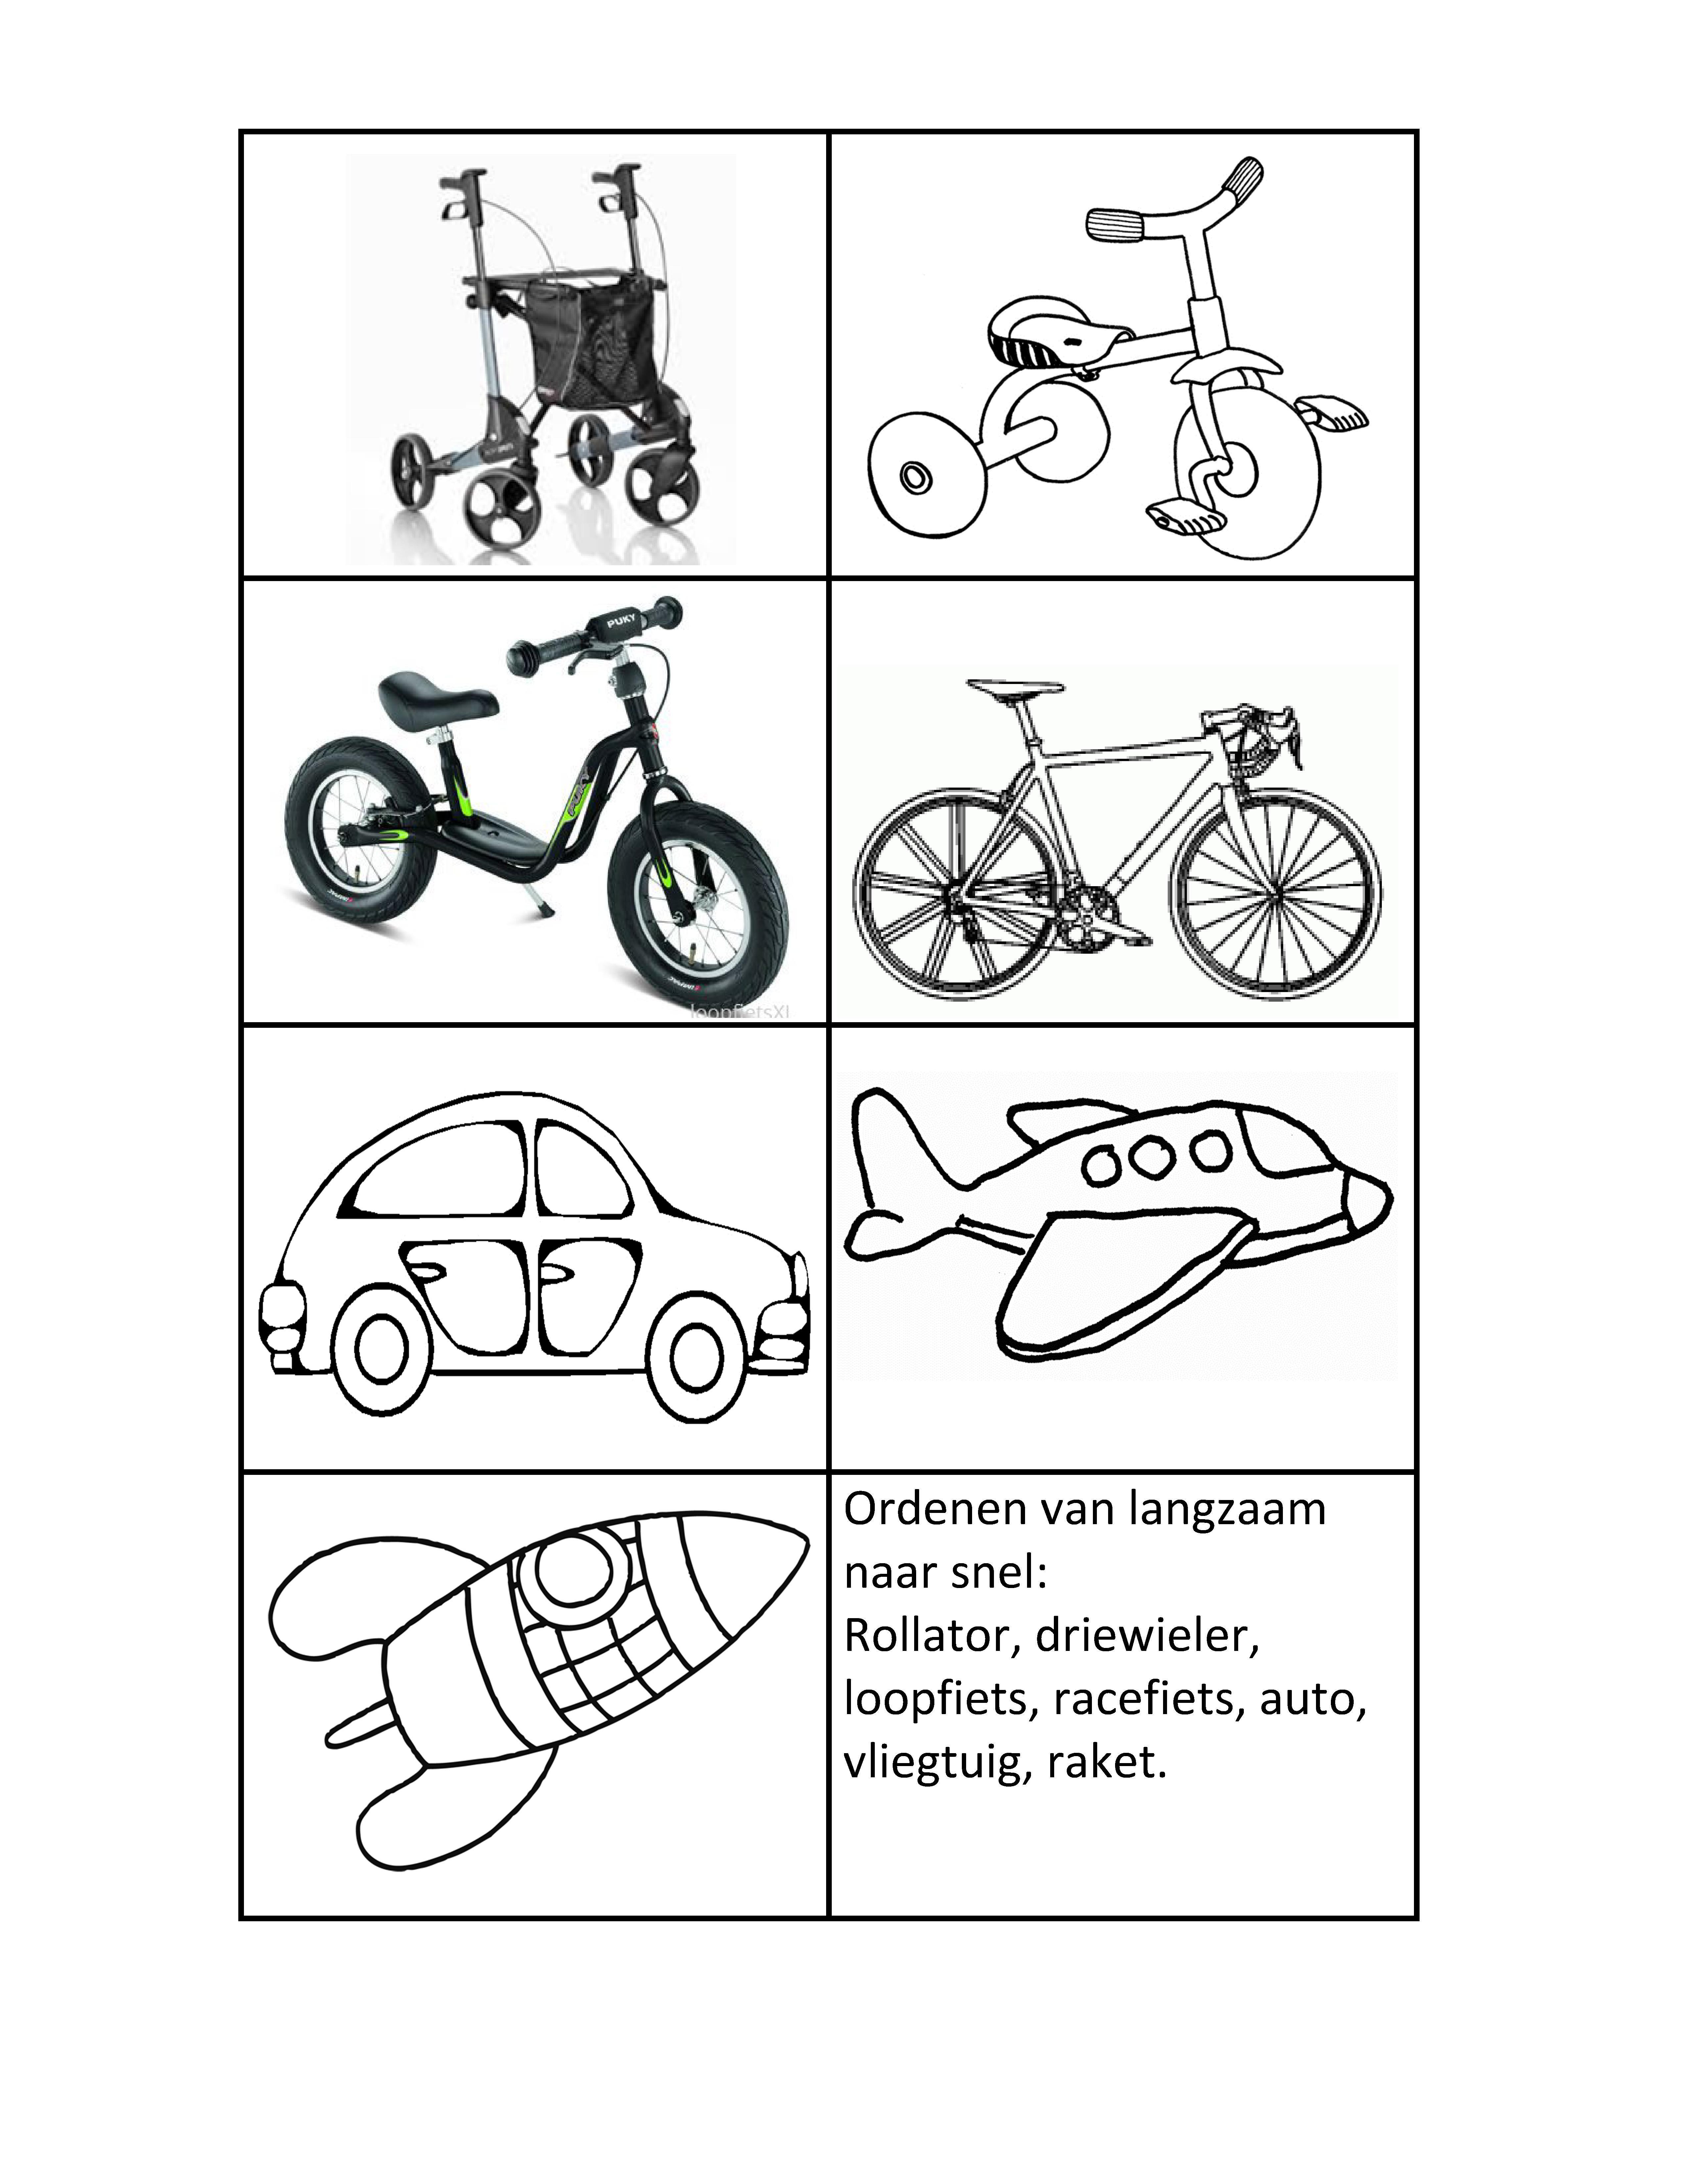 kleurplaat rollator kidkleurplaat nl